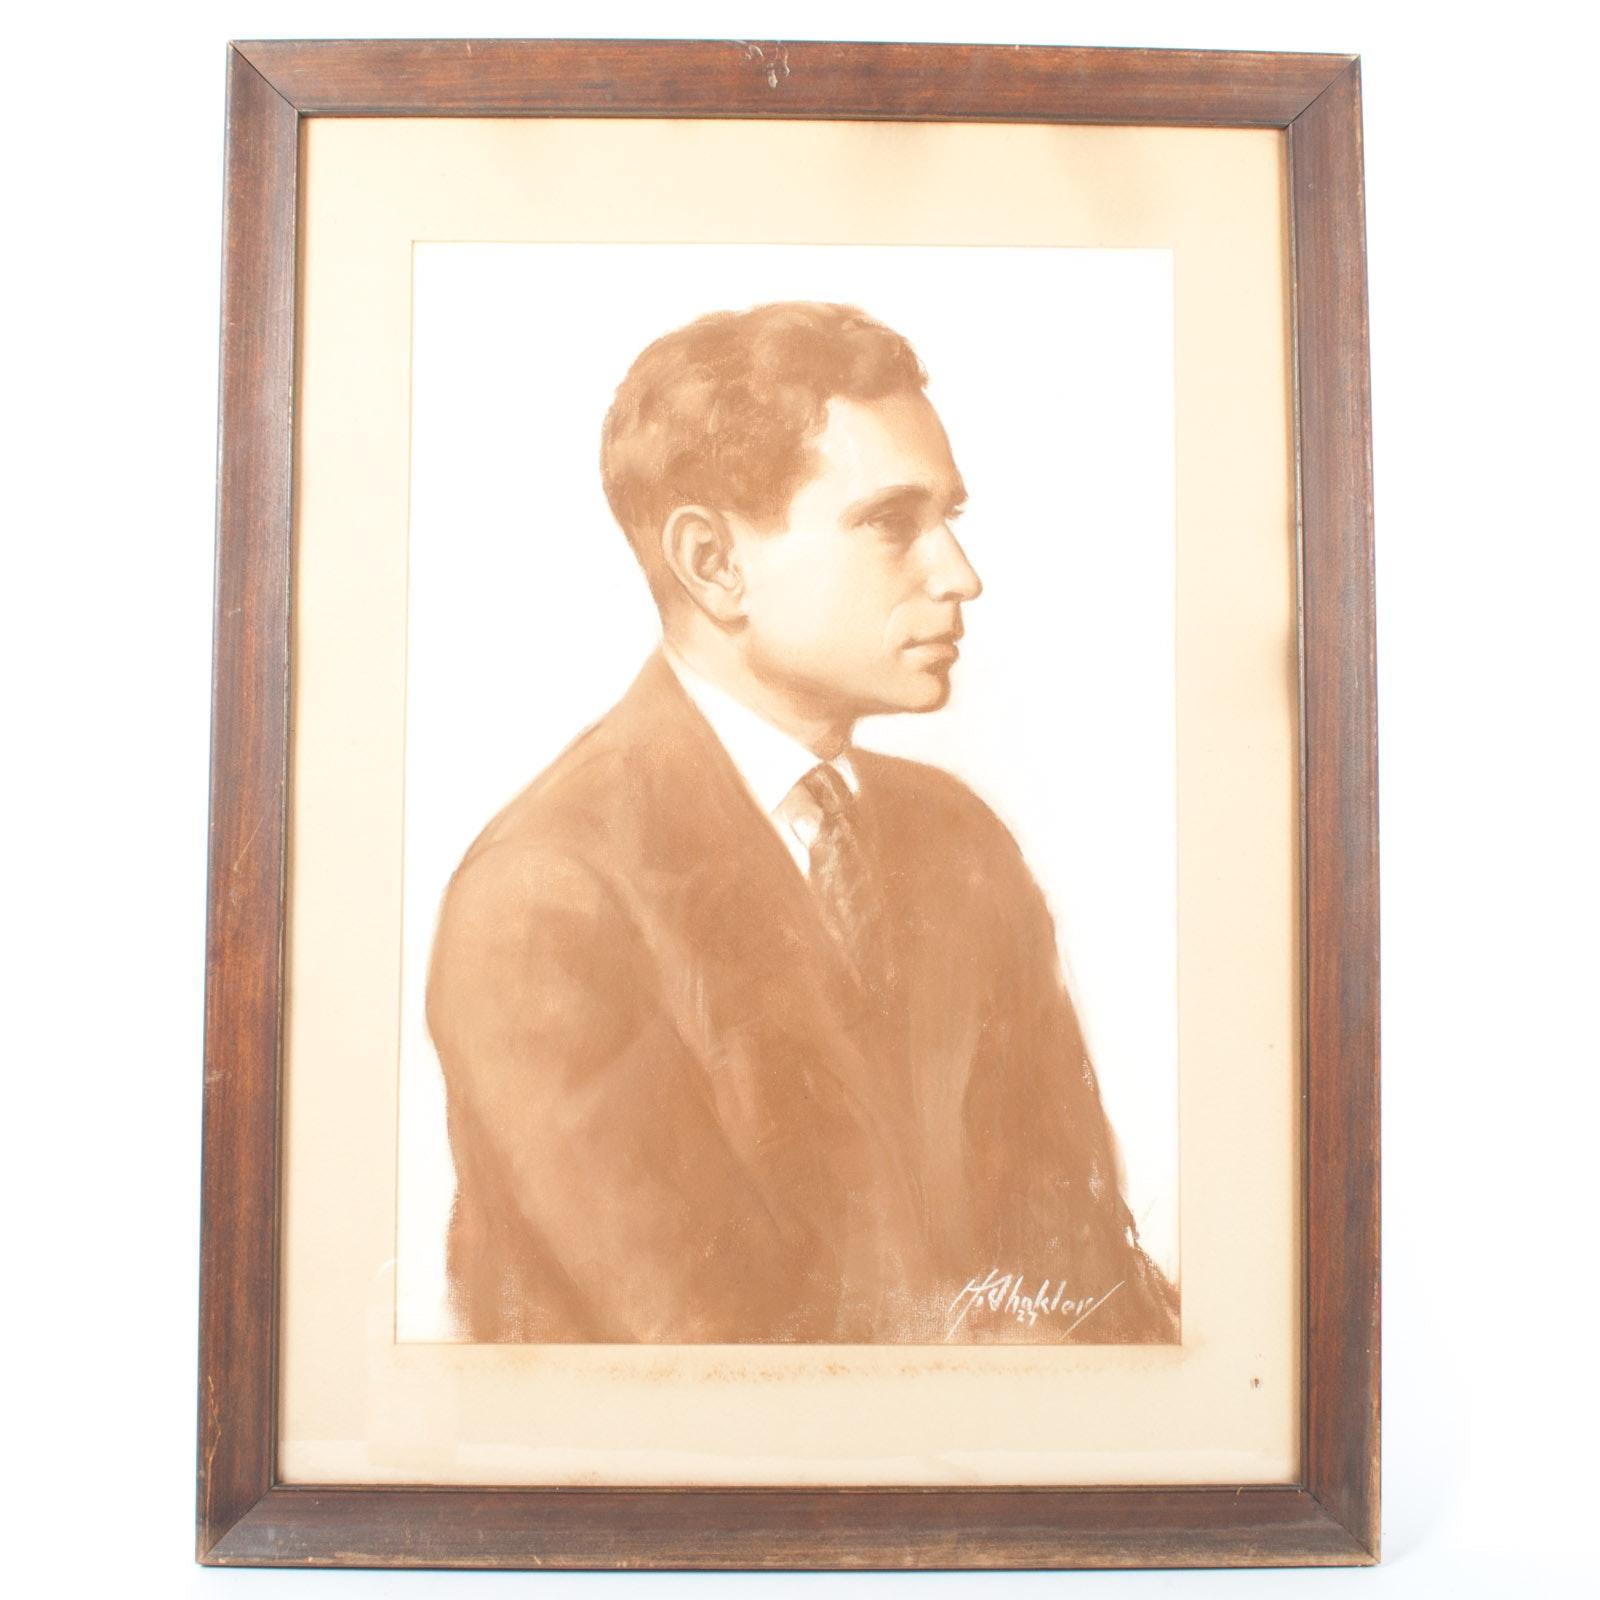 Harry Shokler 1927 Pastel on Paper Sepia Portrait of Man